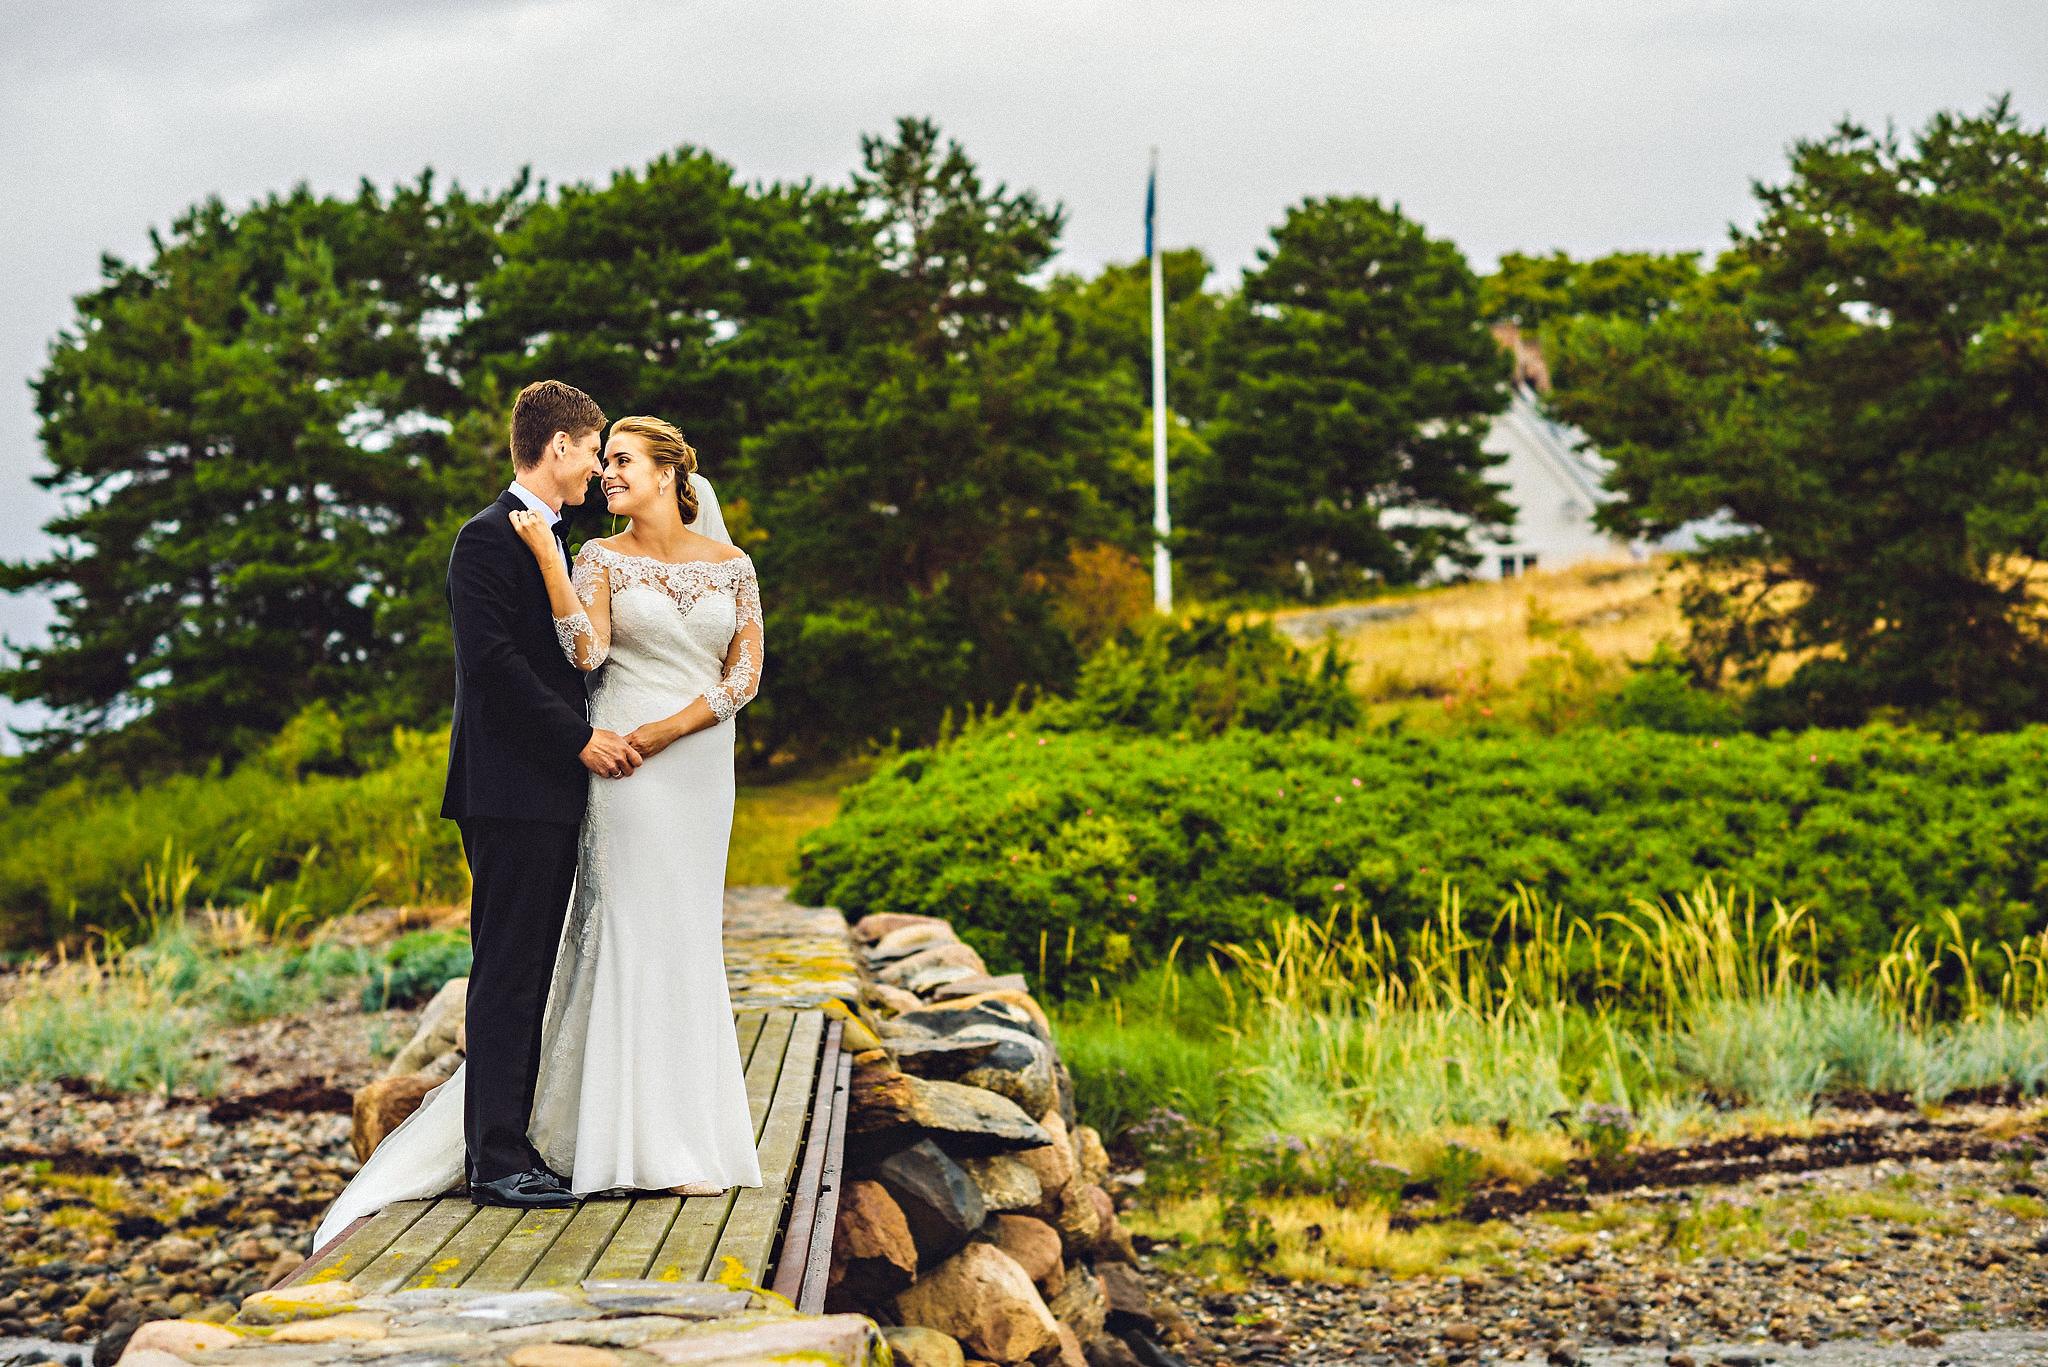 Eirik Halvorsen Henriette og Finn Ole bryllup blog-26.jpg